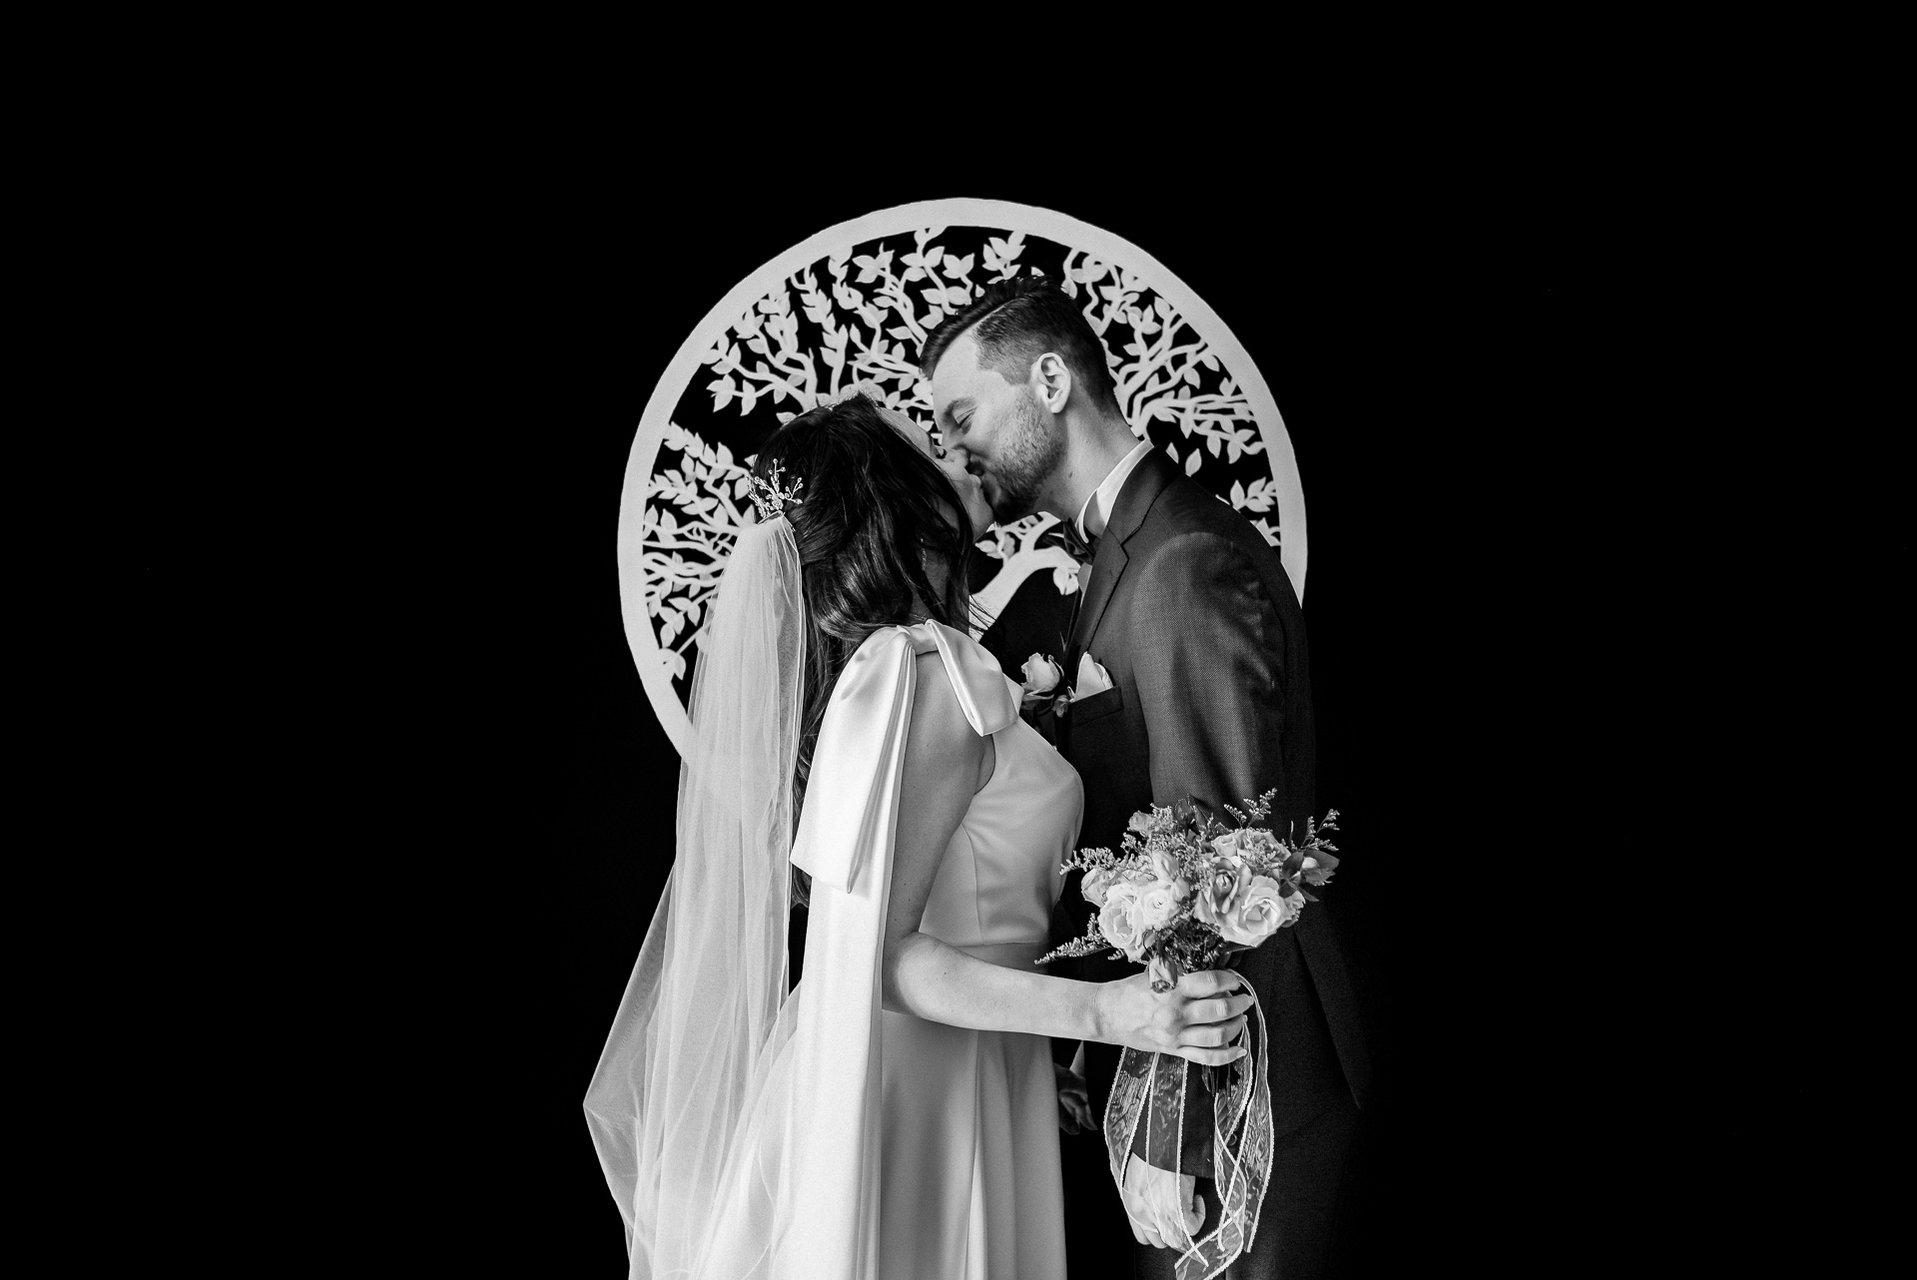 Photo in Wedding | Author Boris Hristov - Борис_Христов | PHOTO FORUM